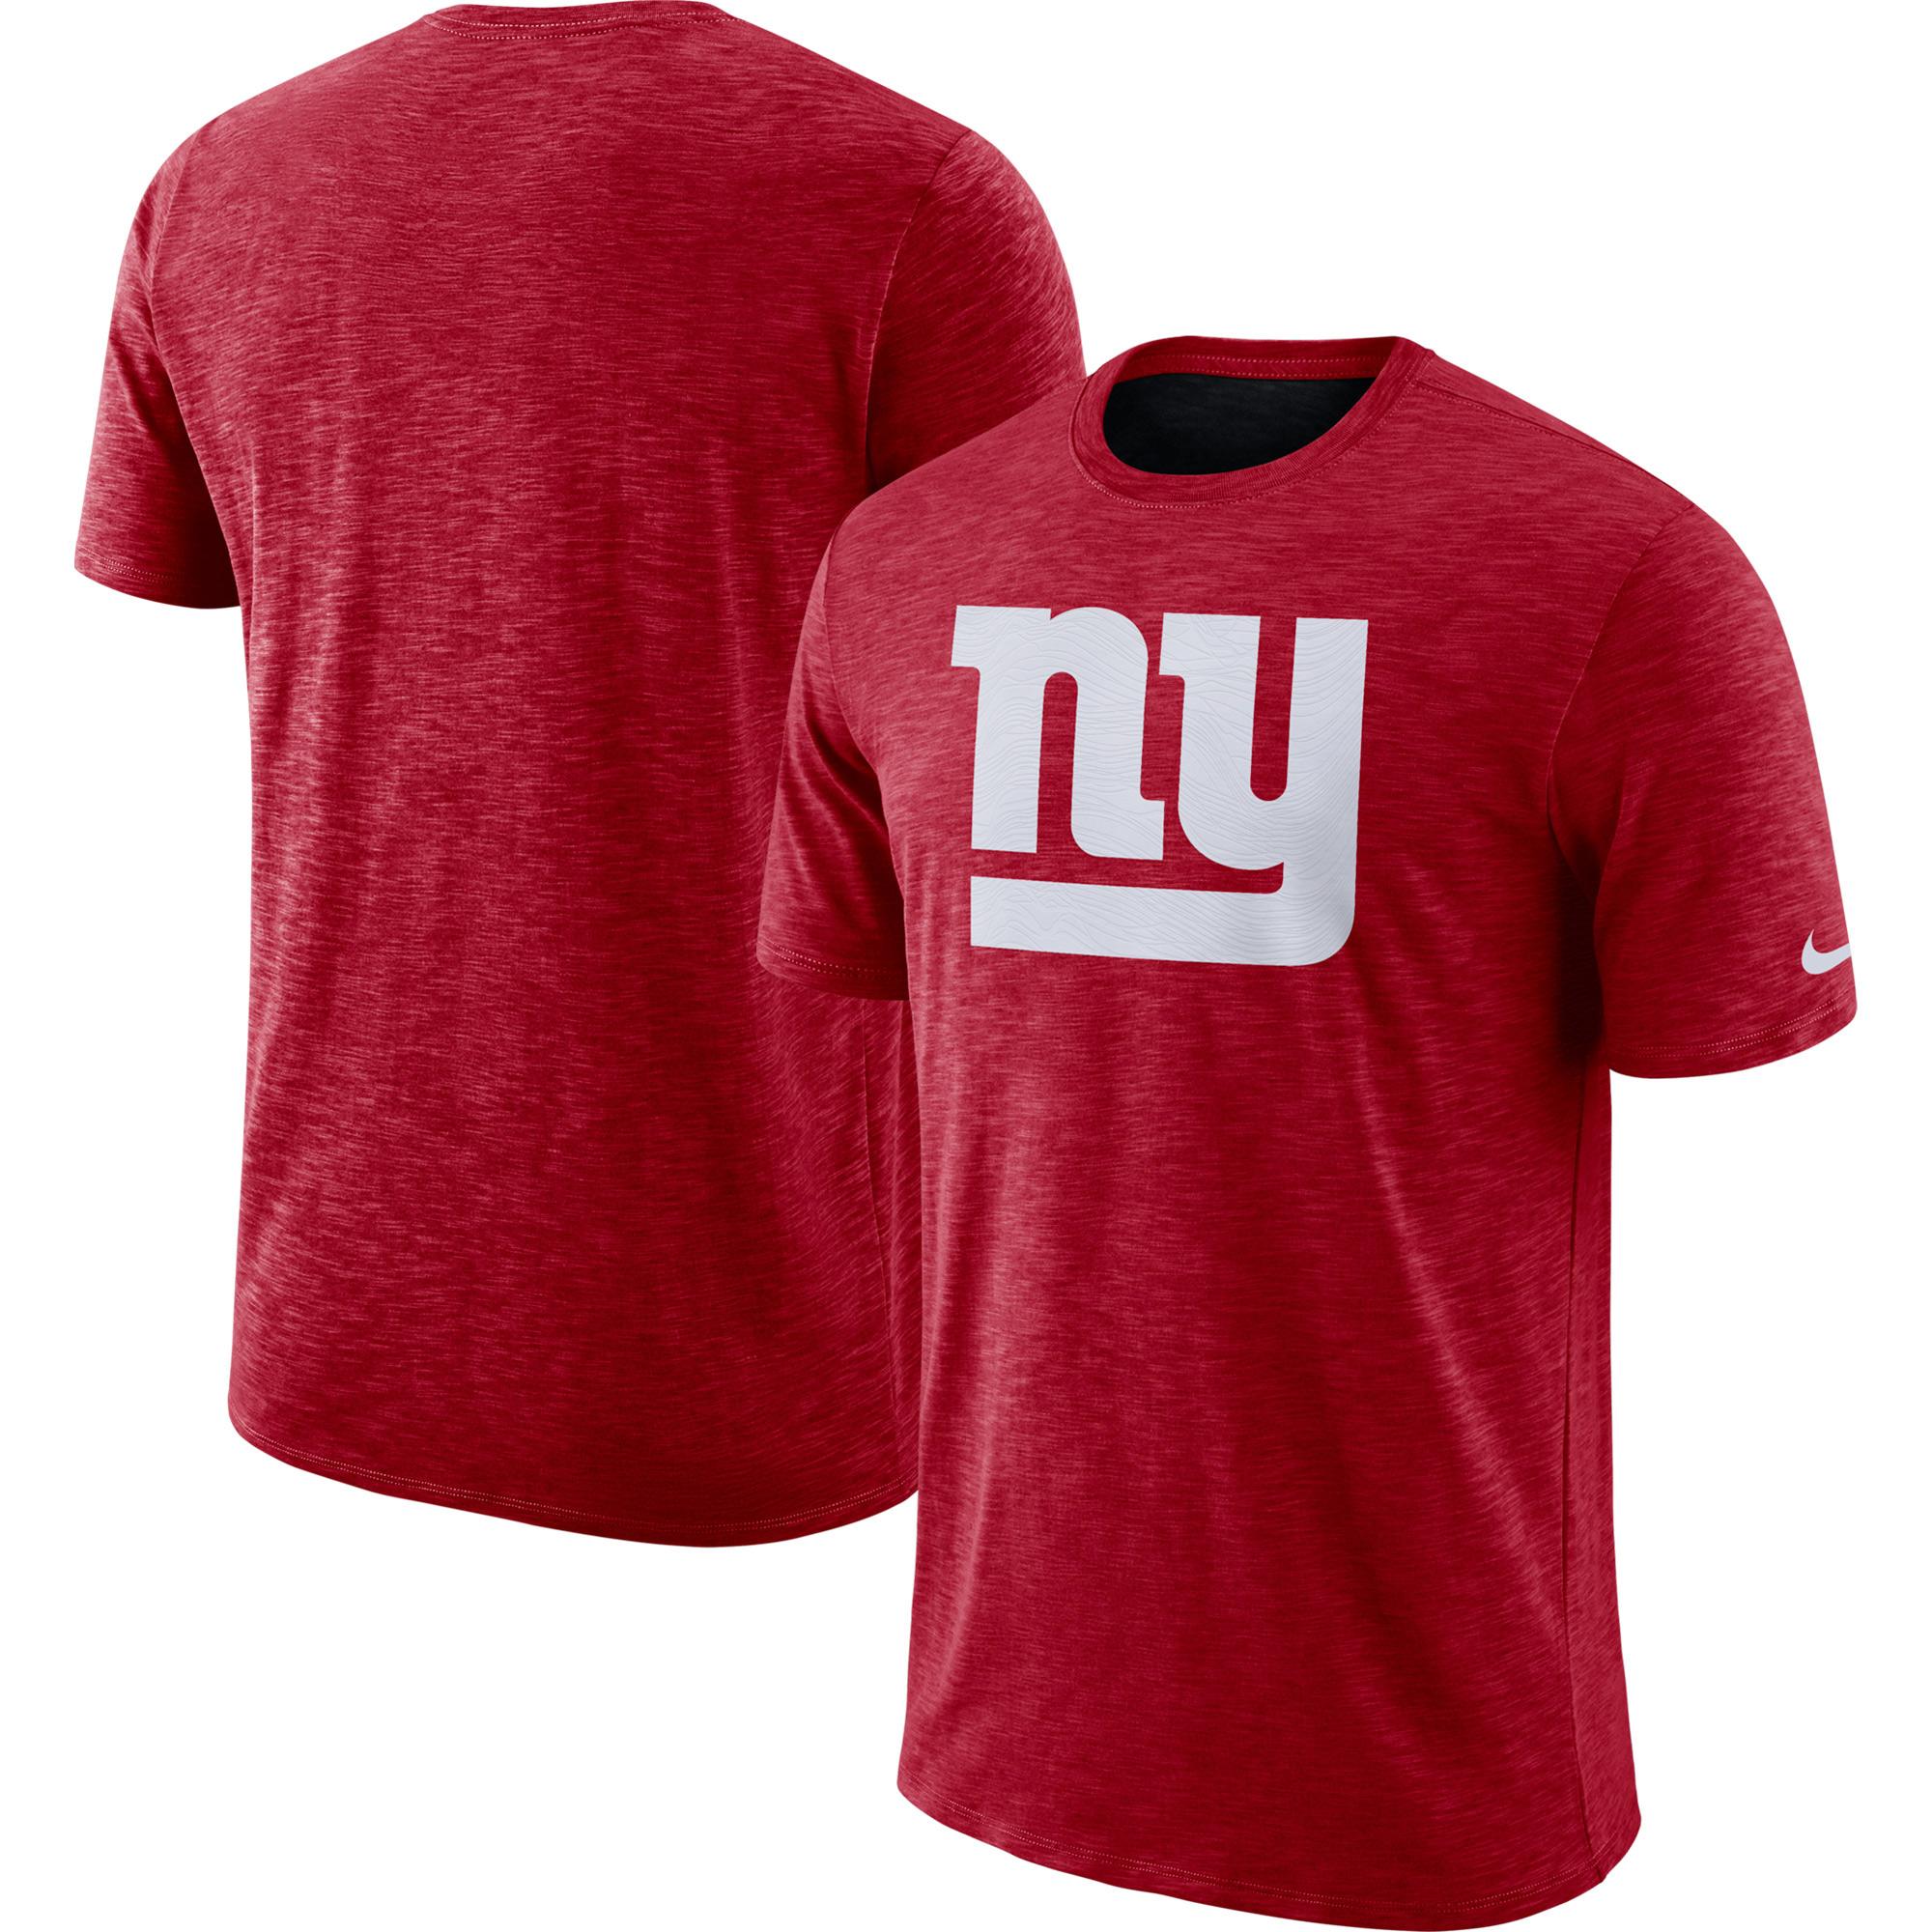 New York Giants Nike Sideline Cotton Slub Performance T-Shirt - Red